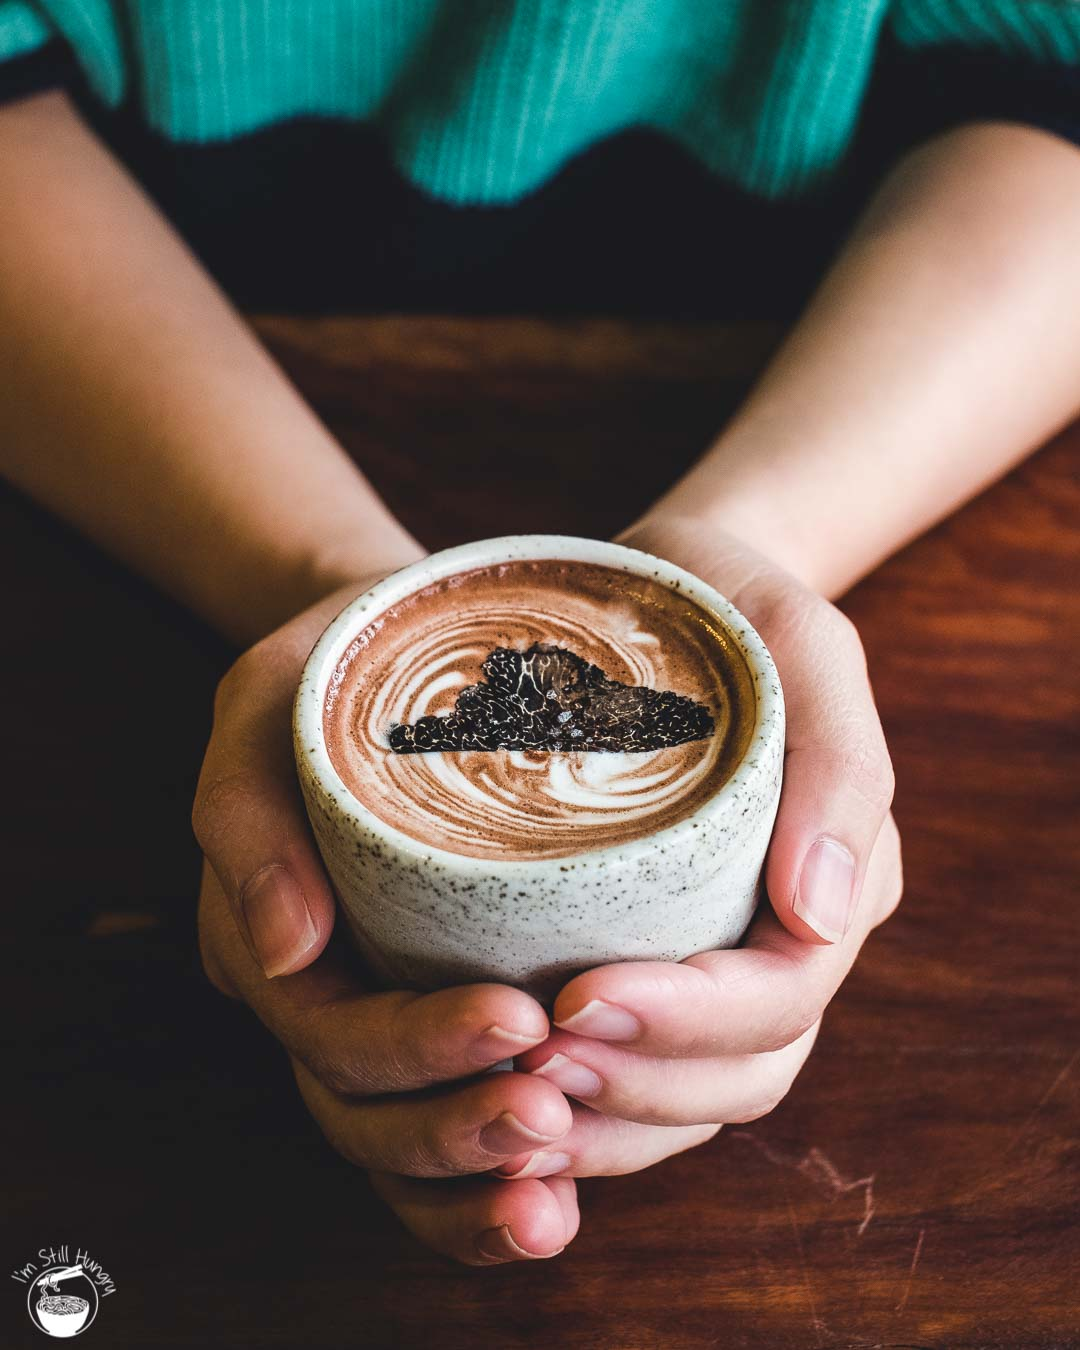 Cavalier Specialty Coffee Truffle-1 Truffle hot chocolate - black truffle jersey milk, Venezuelan cocoa, Marvell Street espresso, sliced Braidwood black truffle